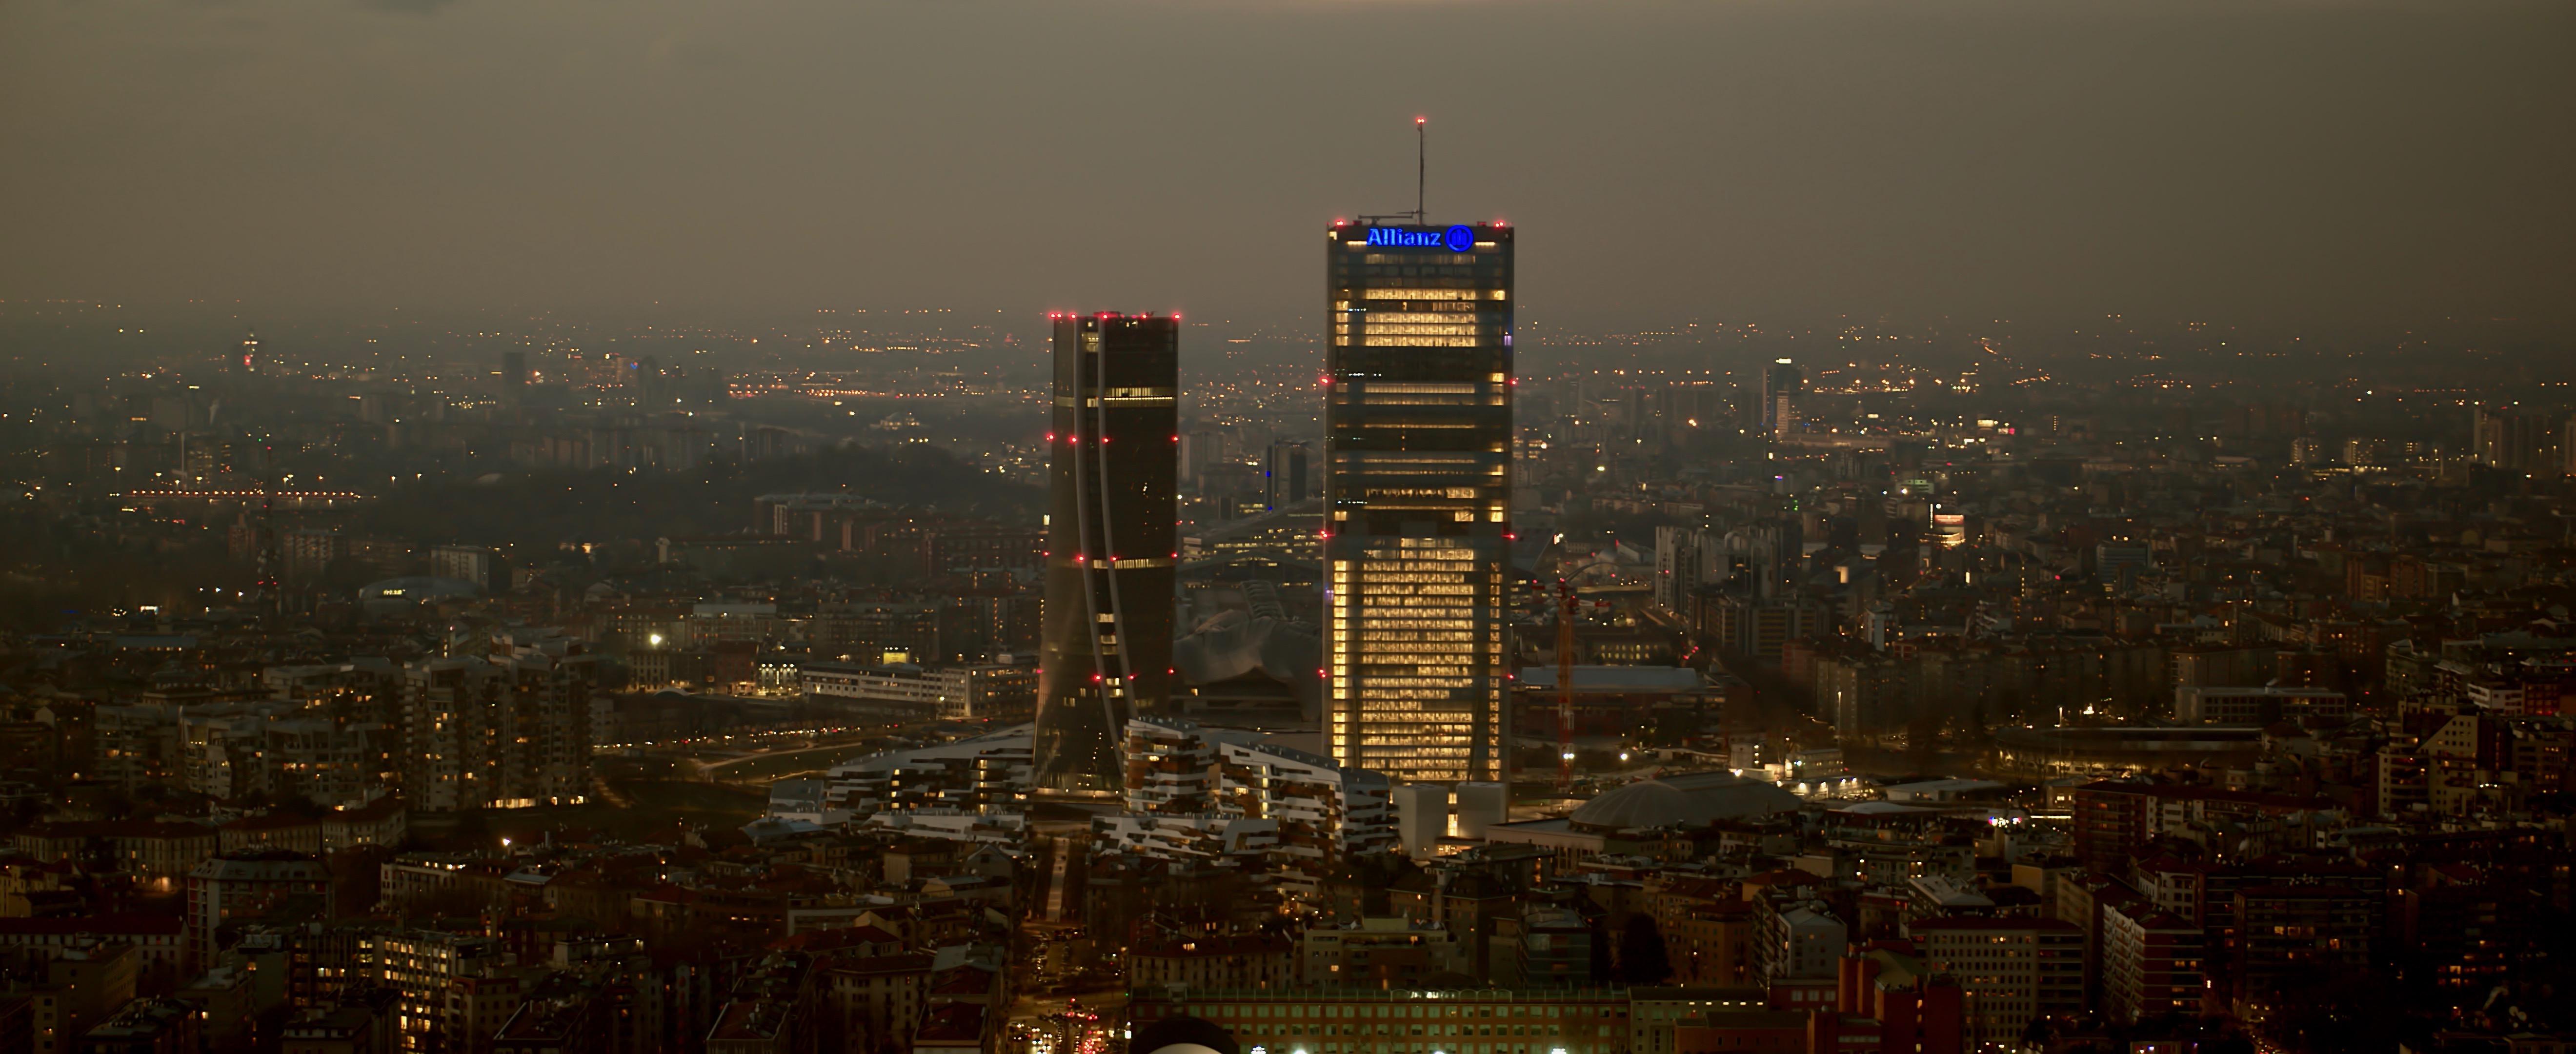 Milano 22 (2).jpg